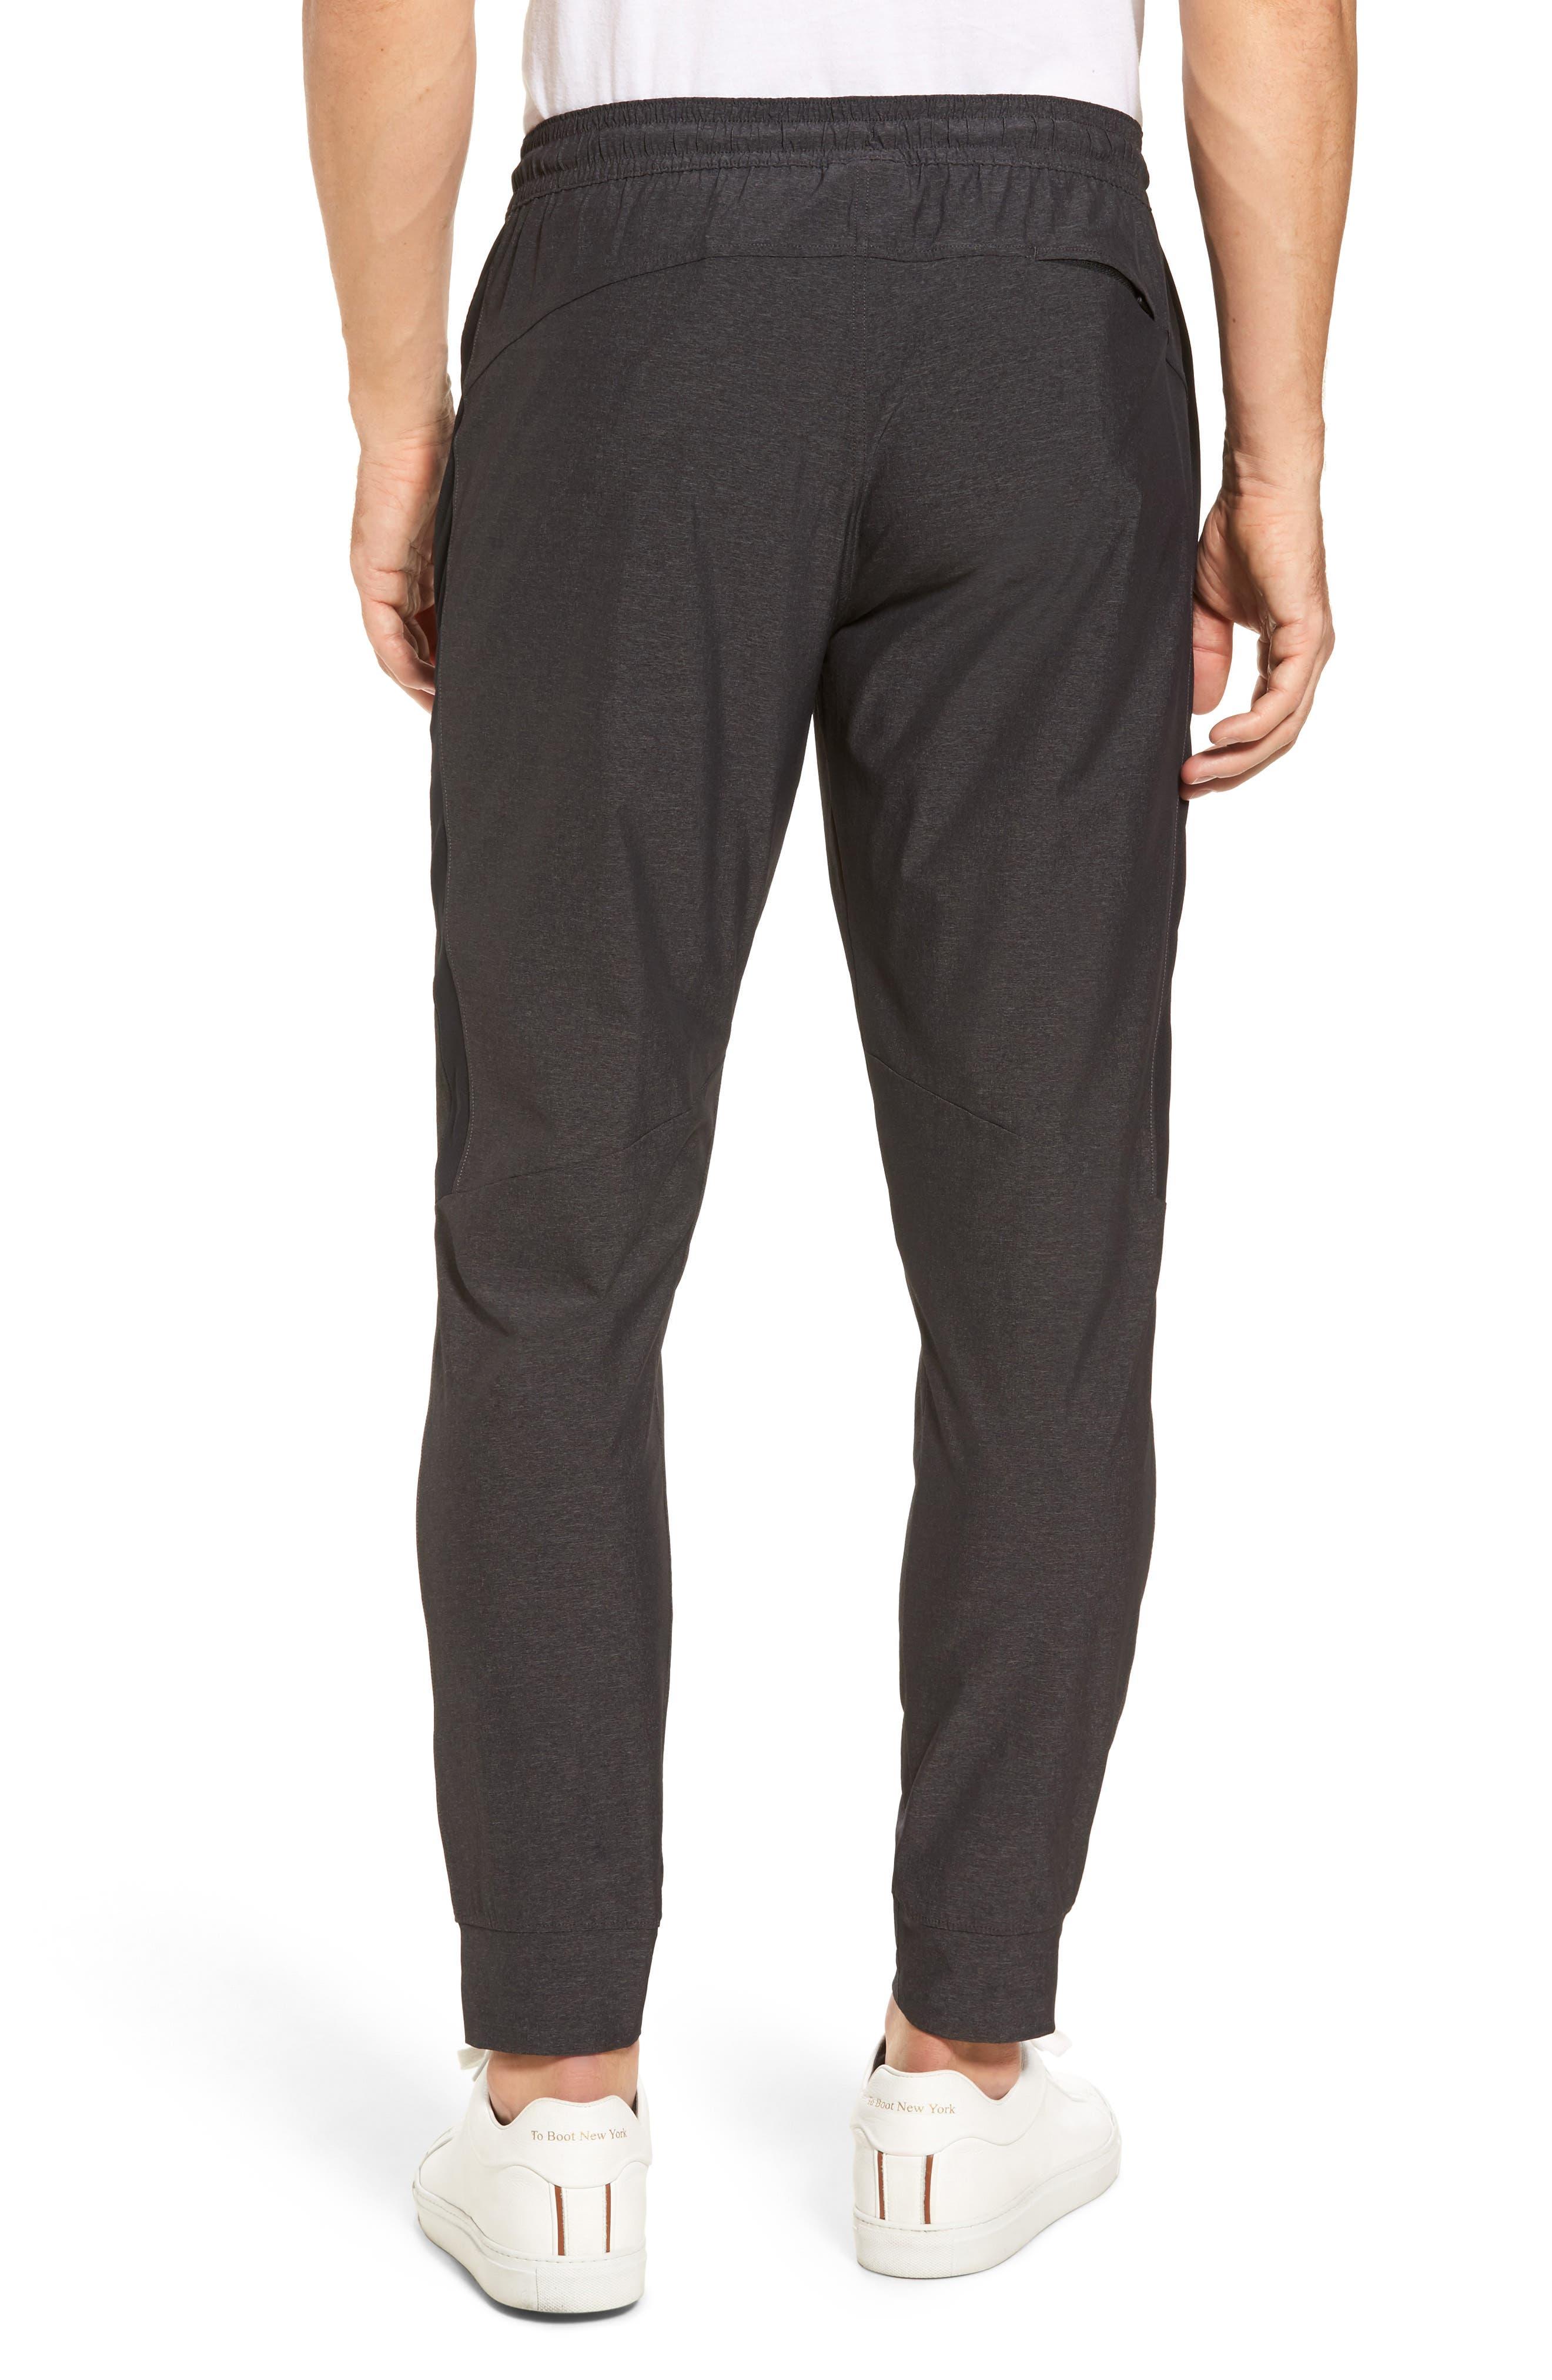 Zip Pocket Sweatpants,                             Alternate thumbnail 2, color,                             Grey Ebony Melange